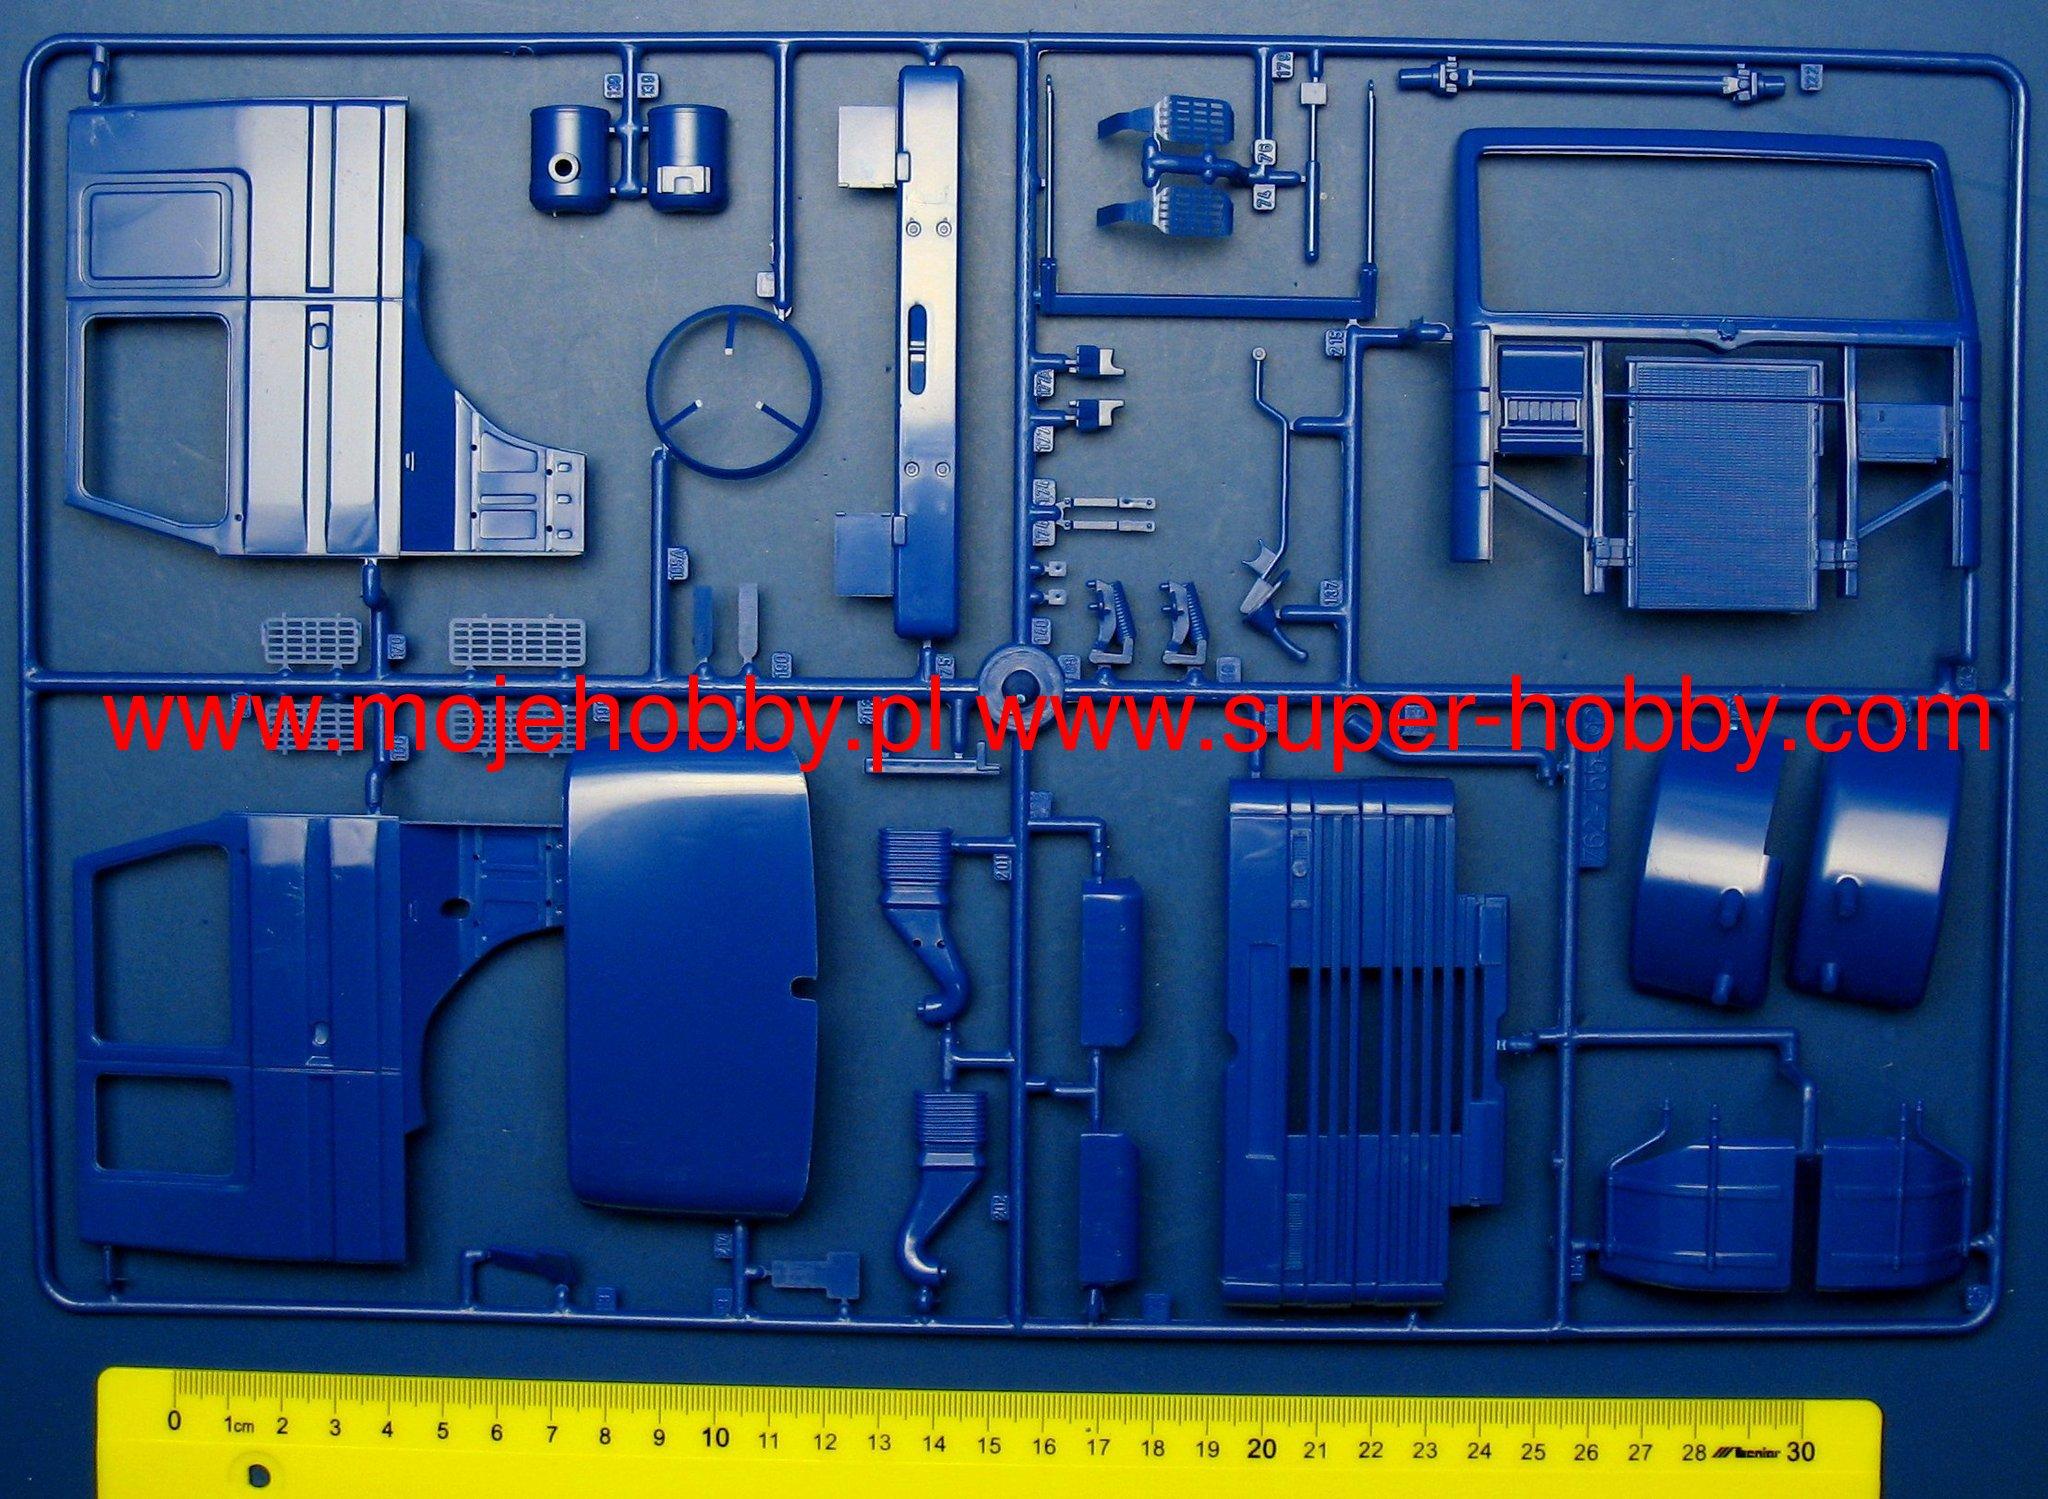 Scania 143 Wiring Diagram 143m Topline 4x2 Italeri 3910rhsuper Hobby